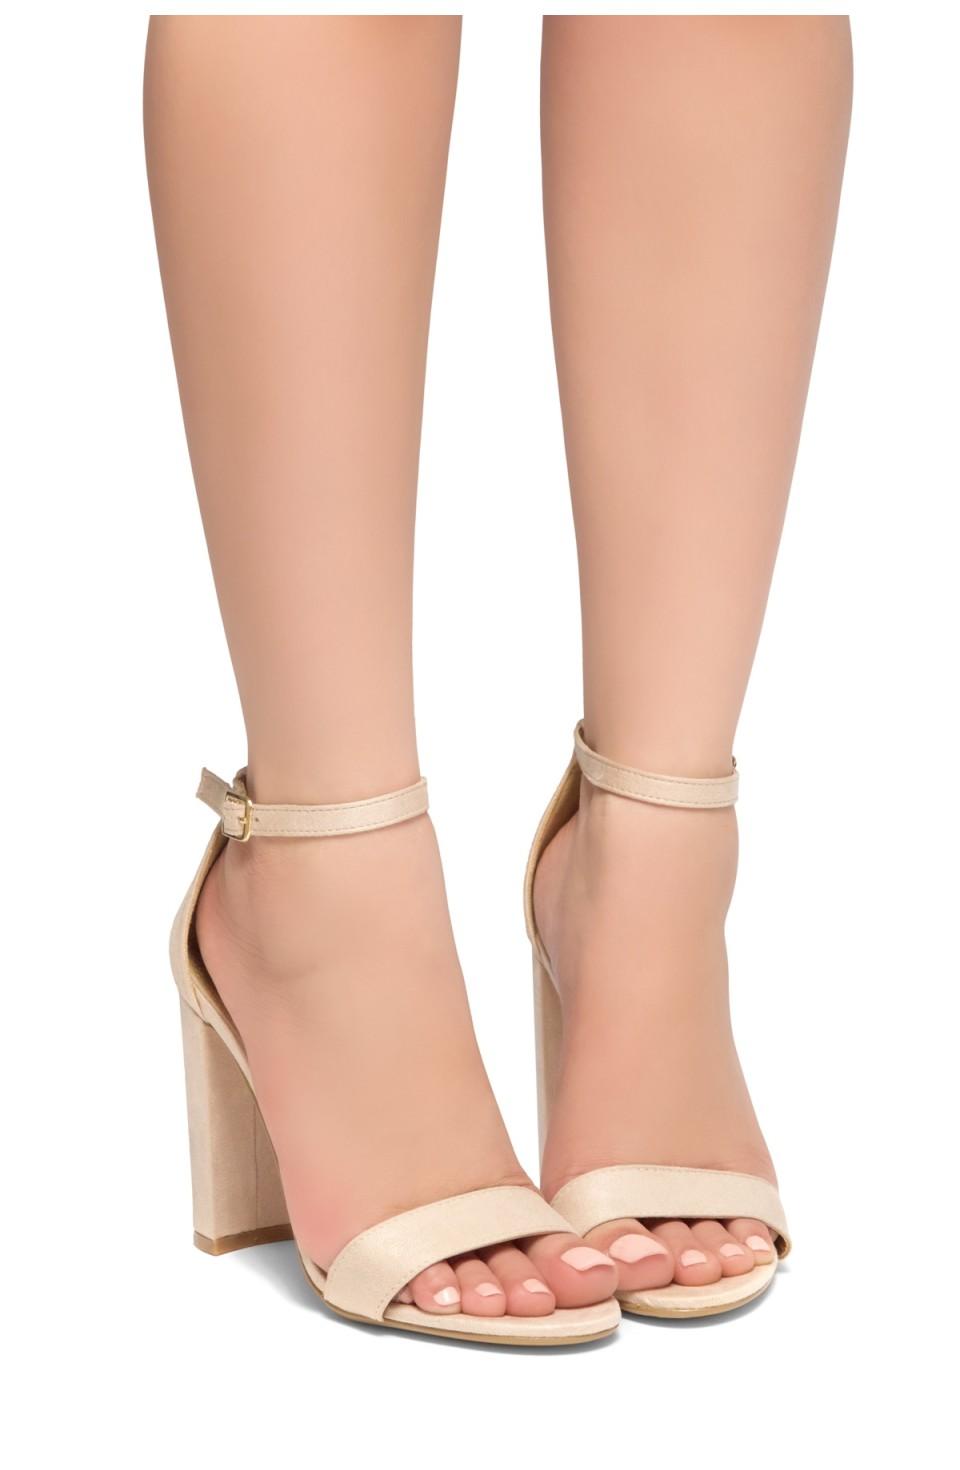 HerStyle Rosemmina Open Toe Ankle Strap Chunky Heel (Nude)